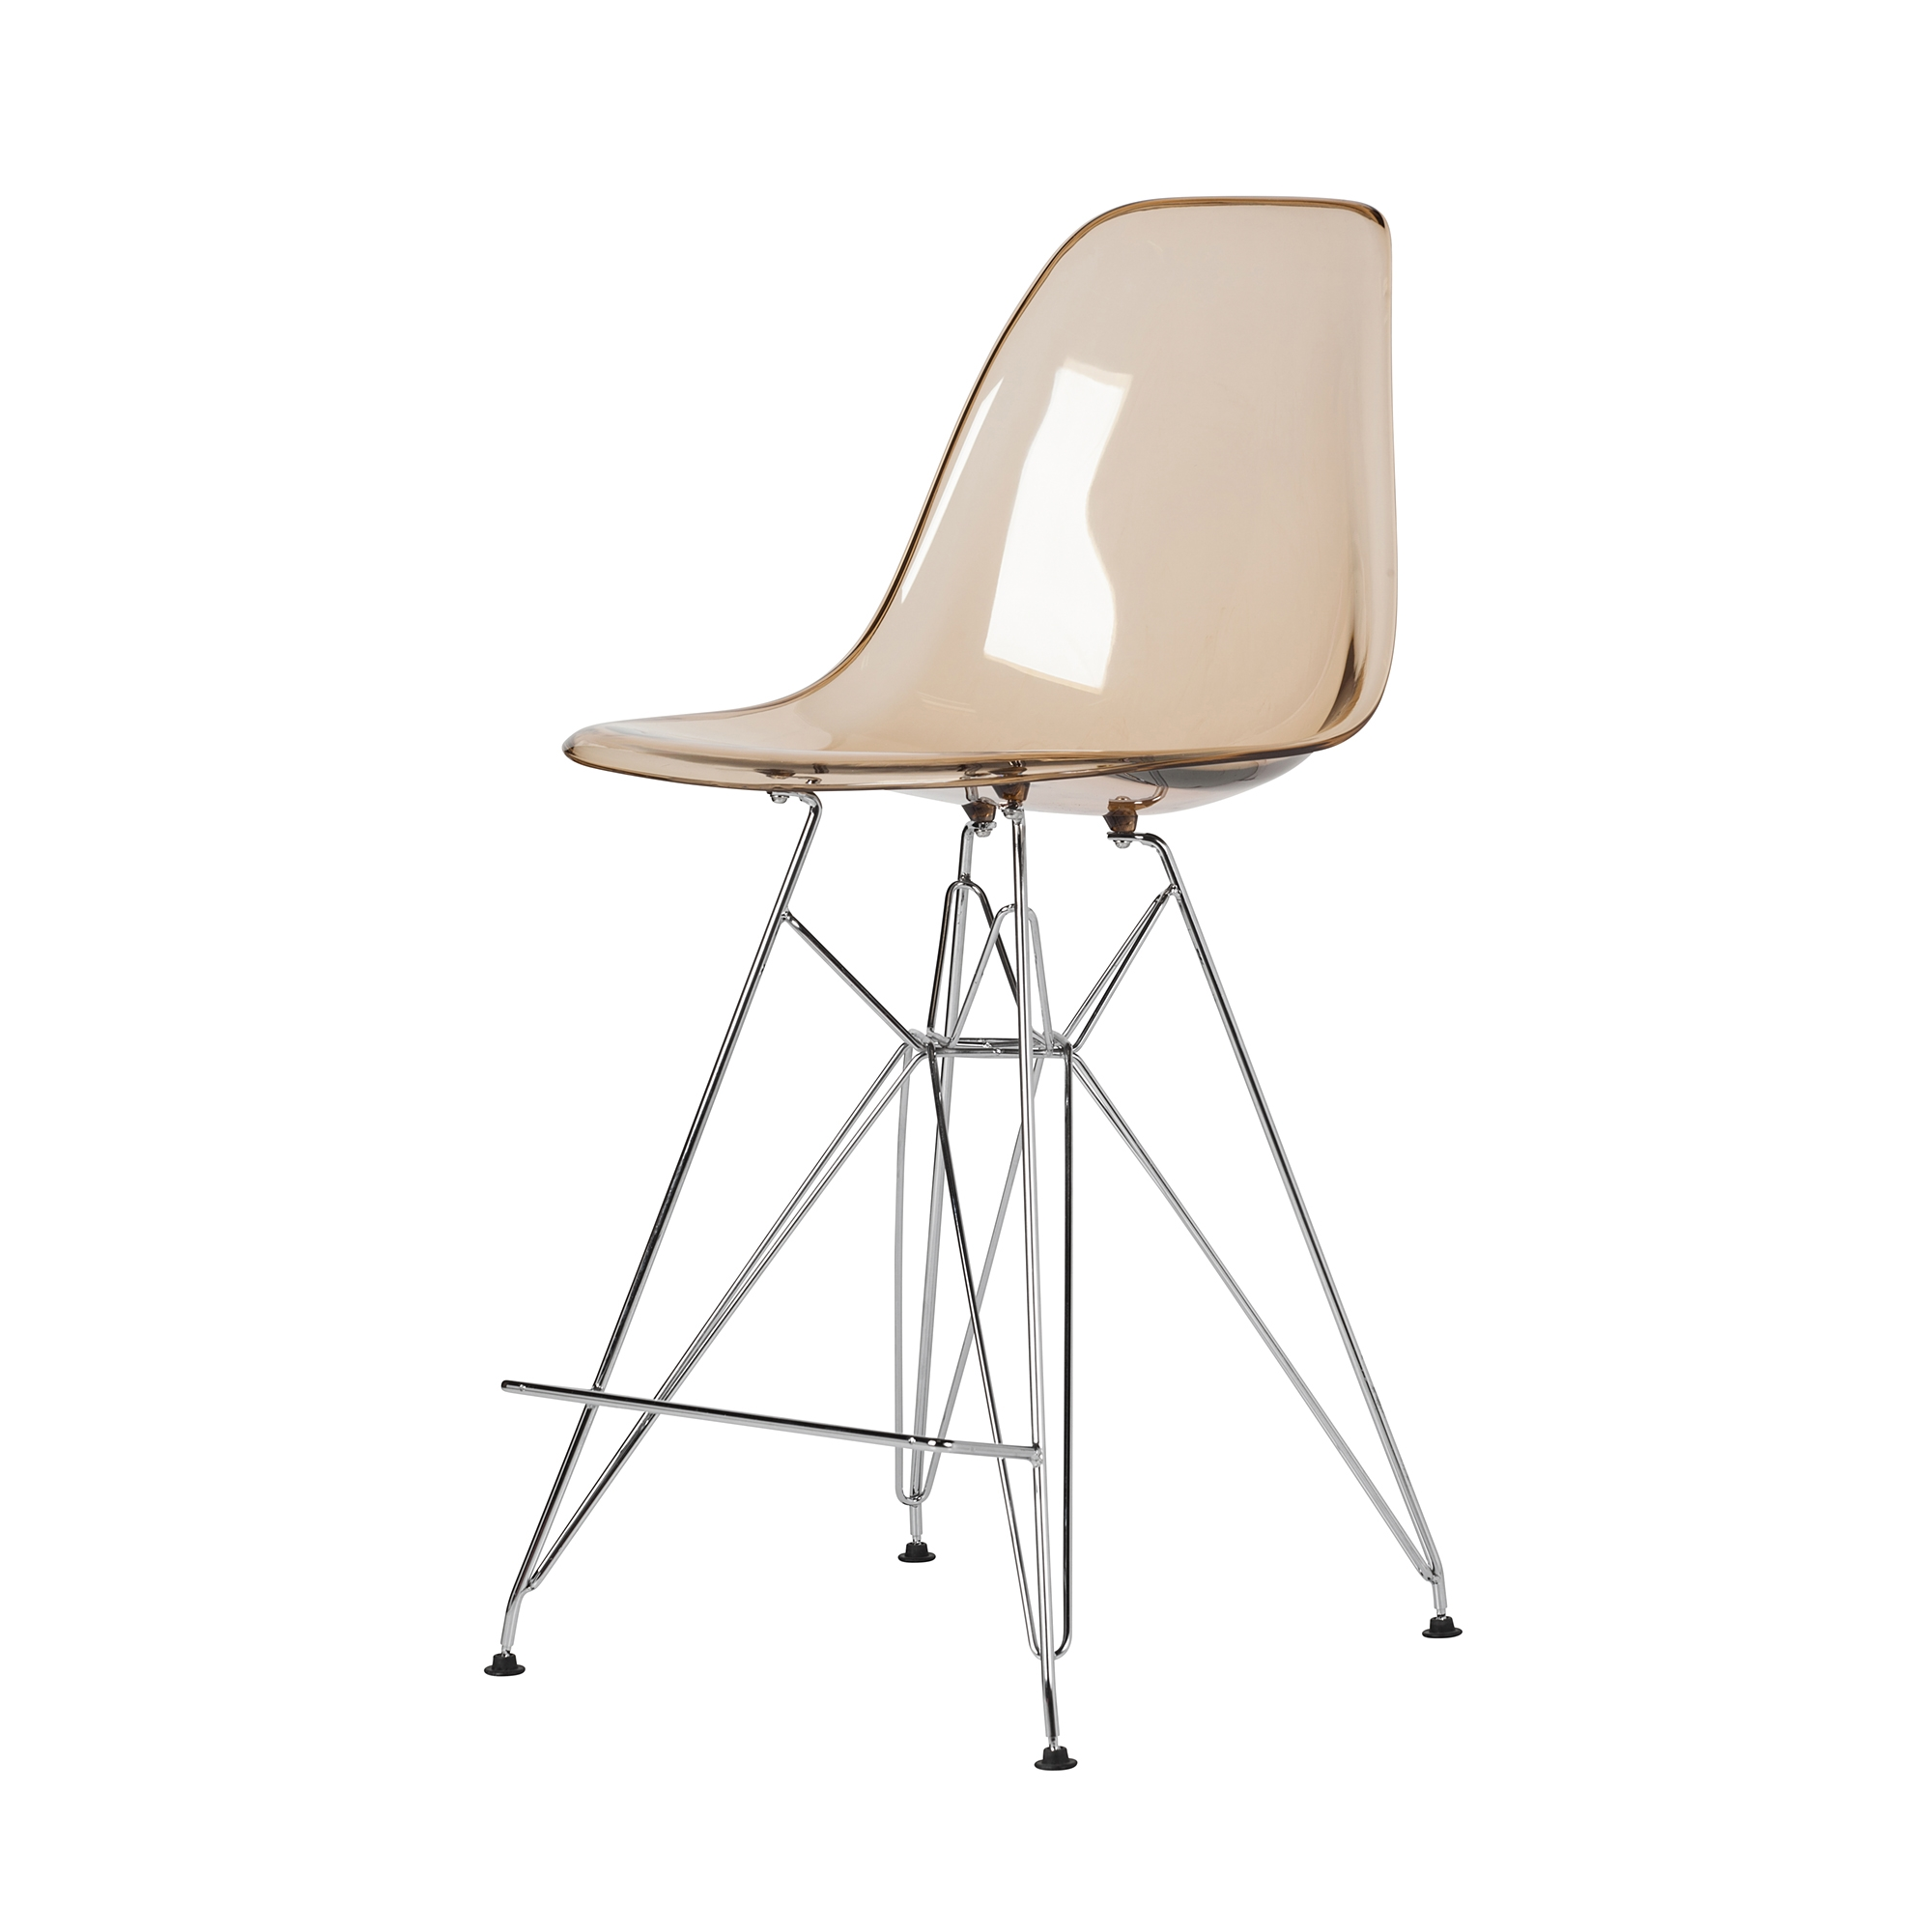 Prime Molded Acrylic Counter Stool In Translucent Amber And Gold Finish Legs The Khazana Home Austin Furniture Store Inzonedesignstudio Interior Chair Design Inzonedesignstudiocom